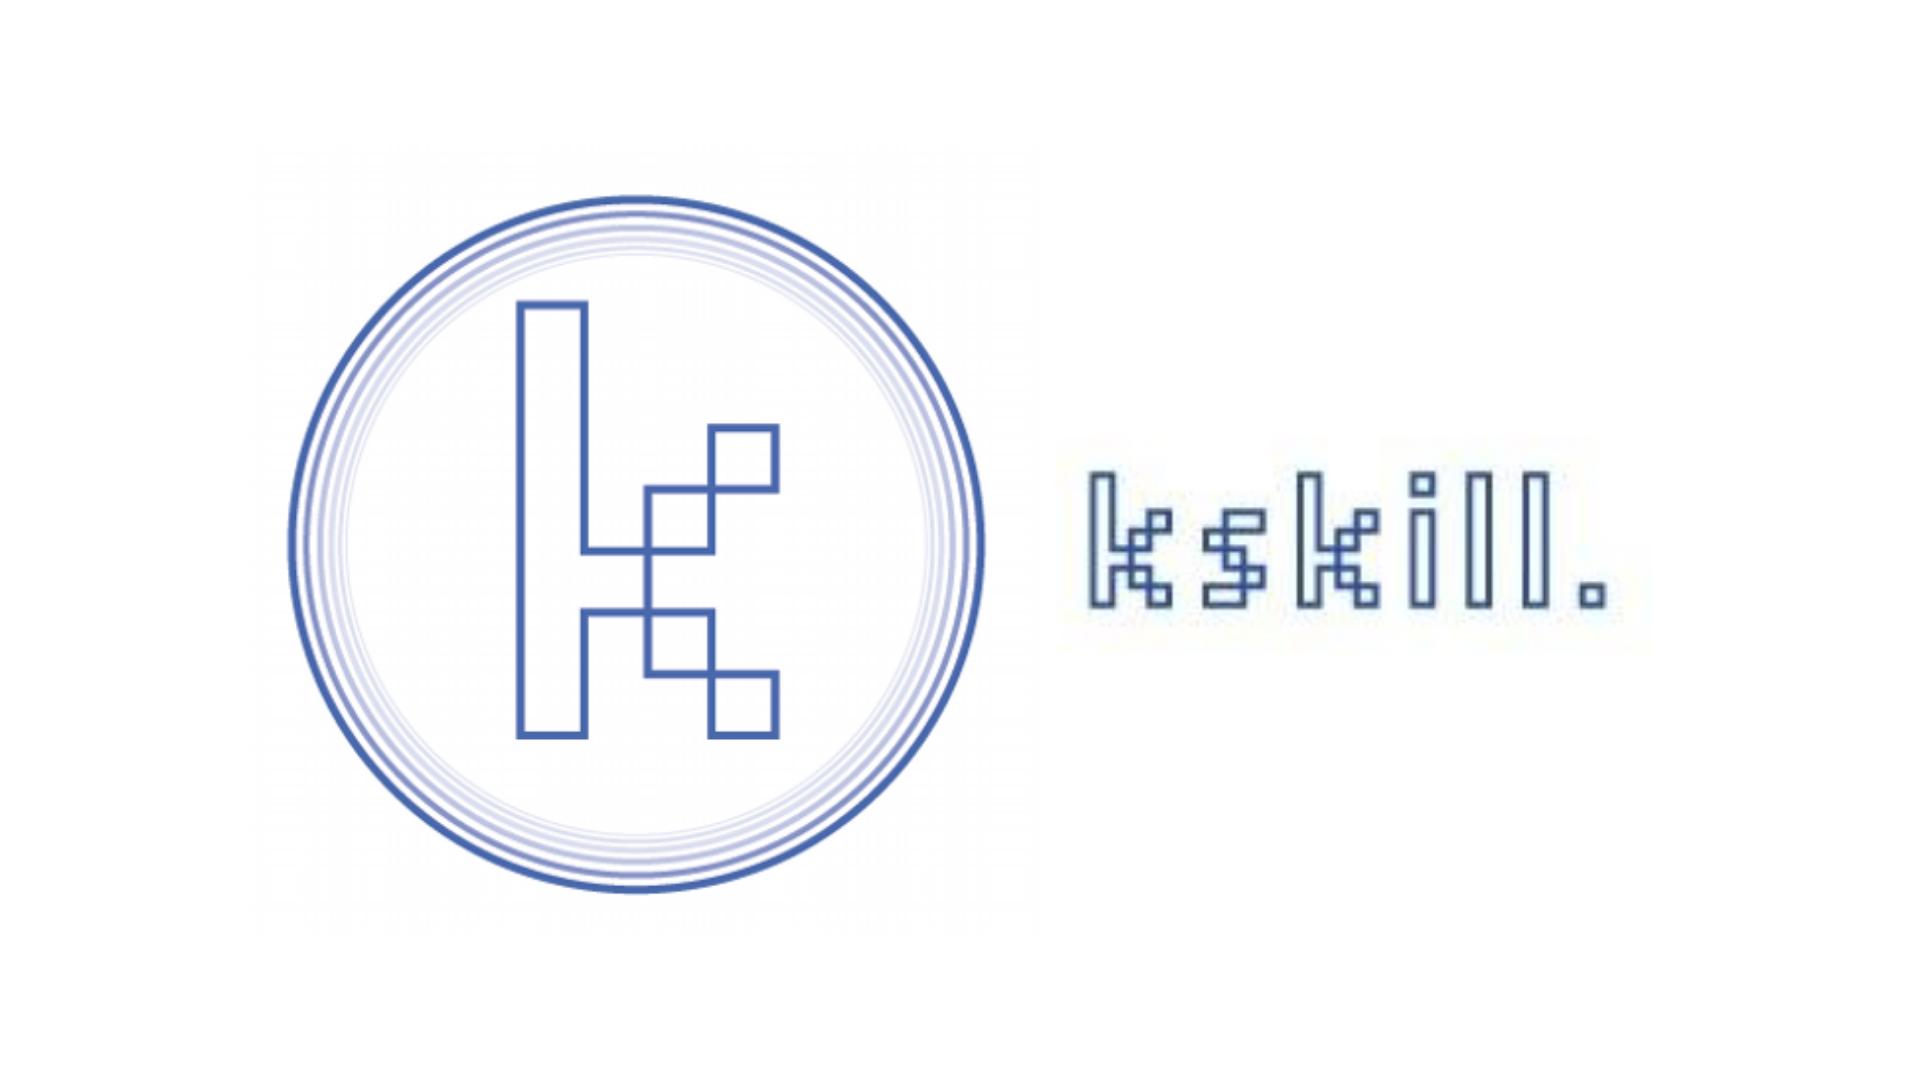 kskill.png